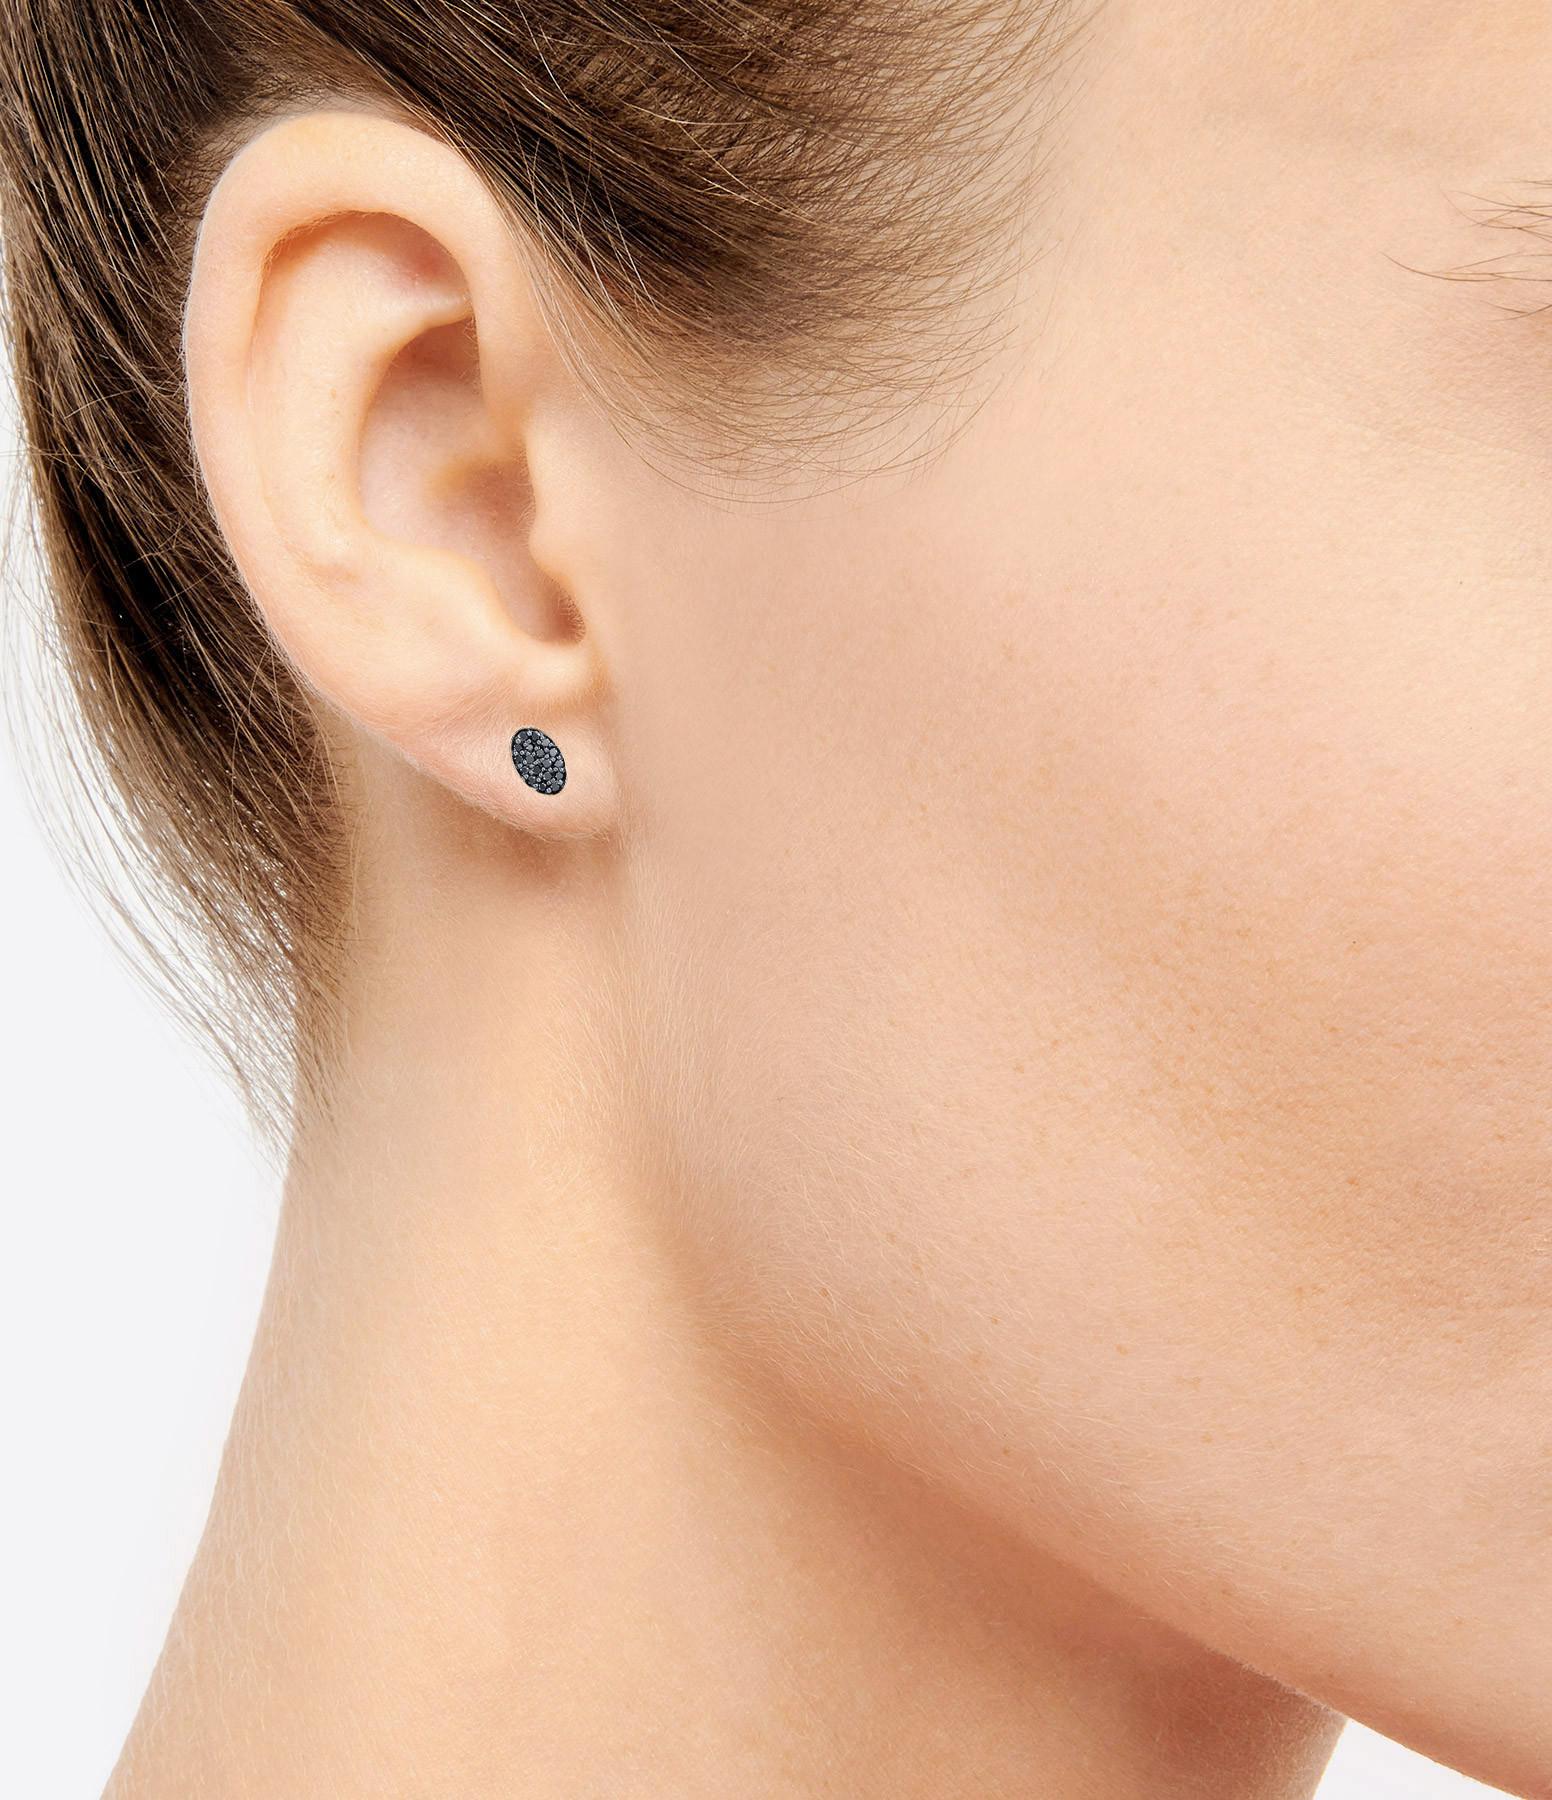 GINETTE_NY - Boucles d'oreilles Sequin Or Rose Diamants Noirs